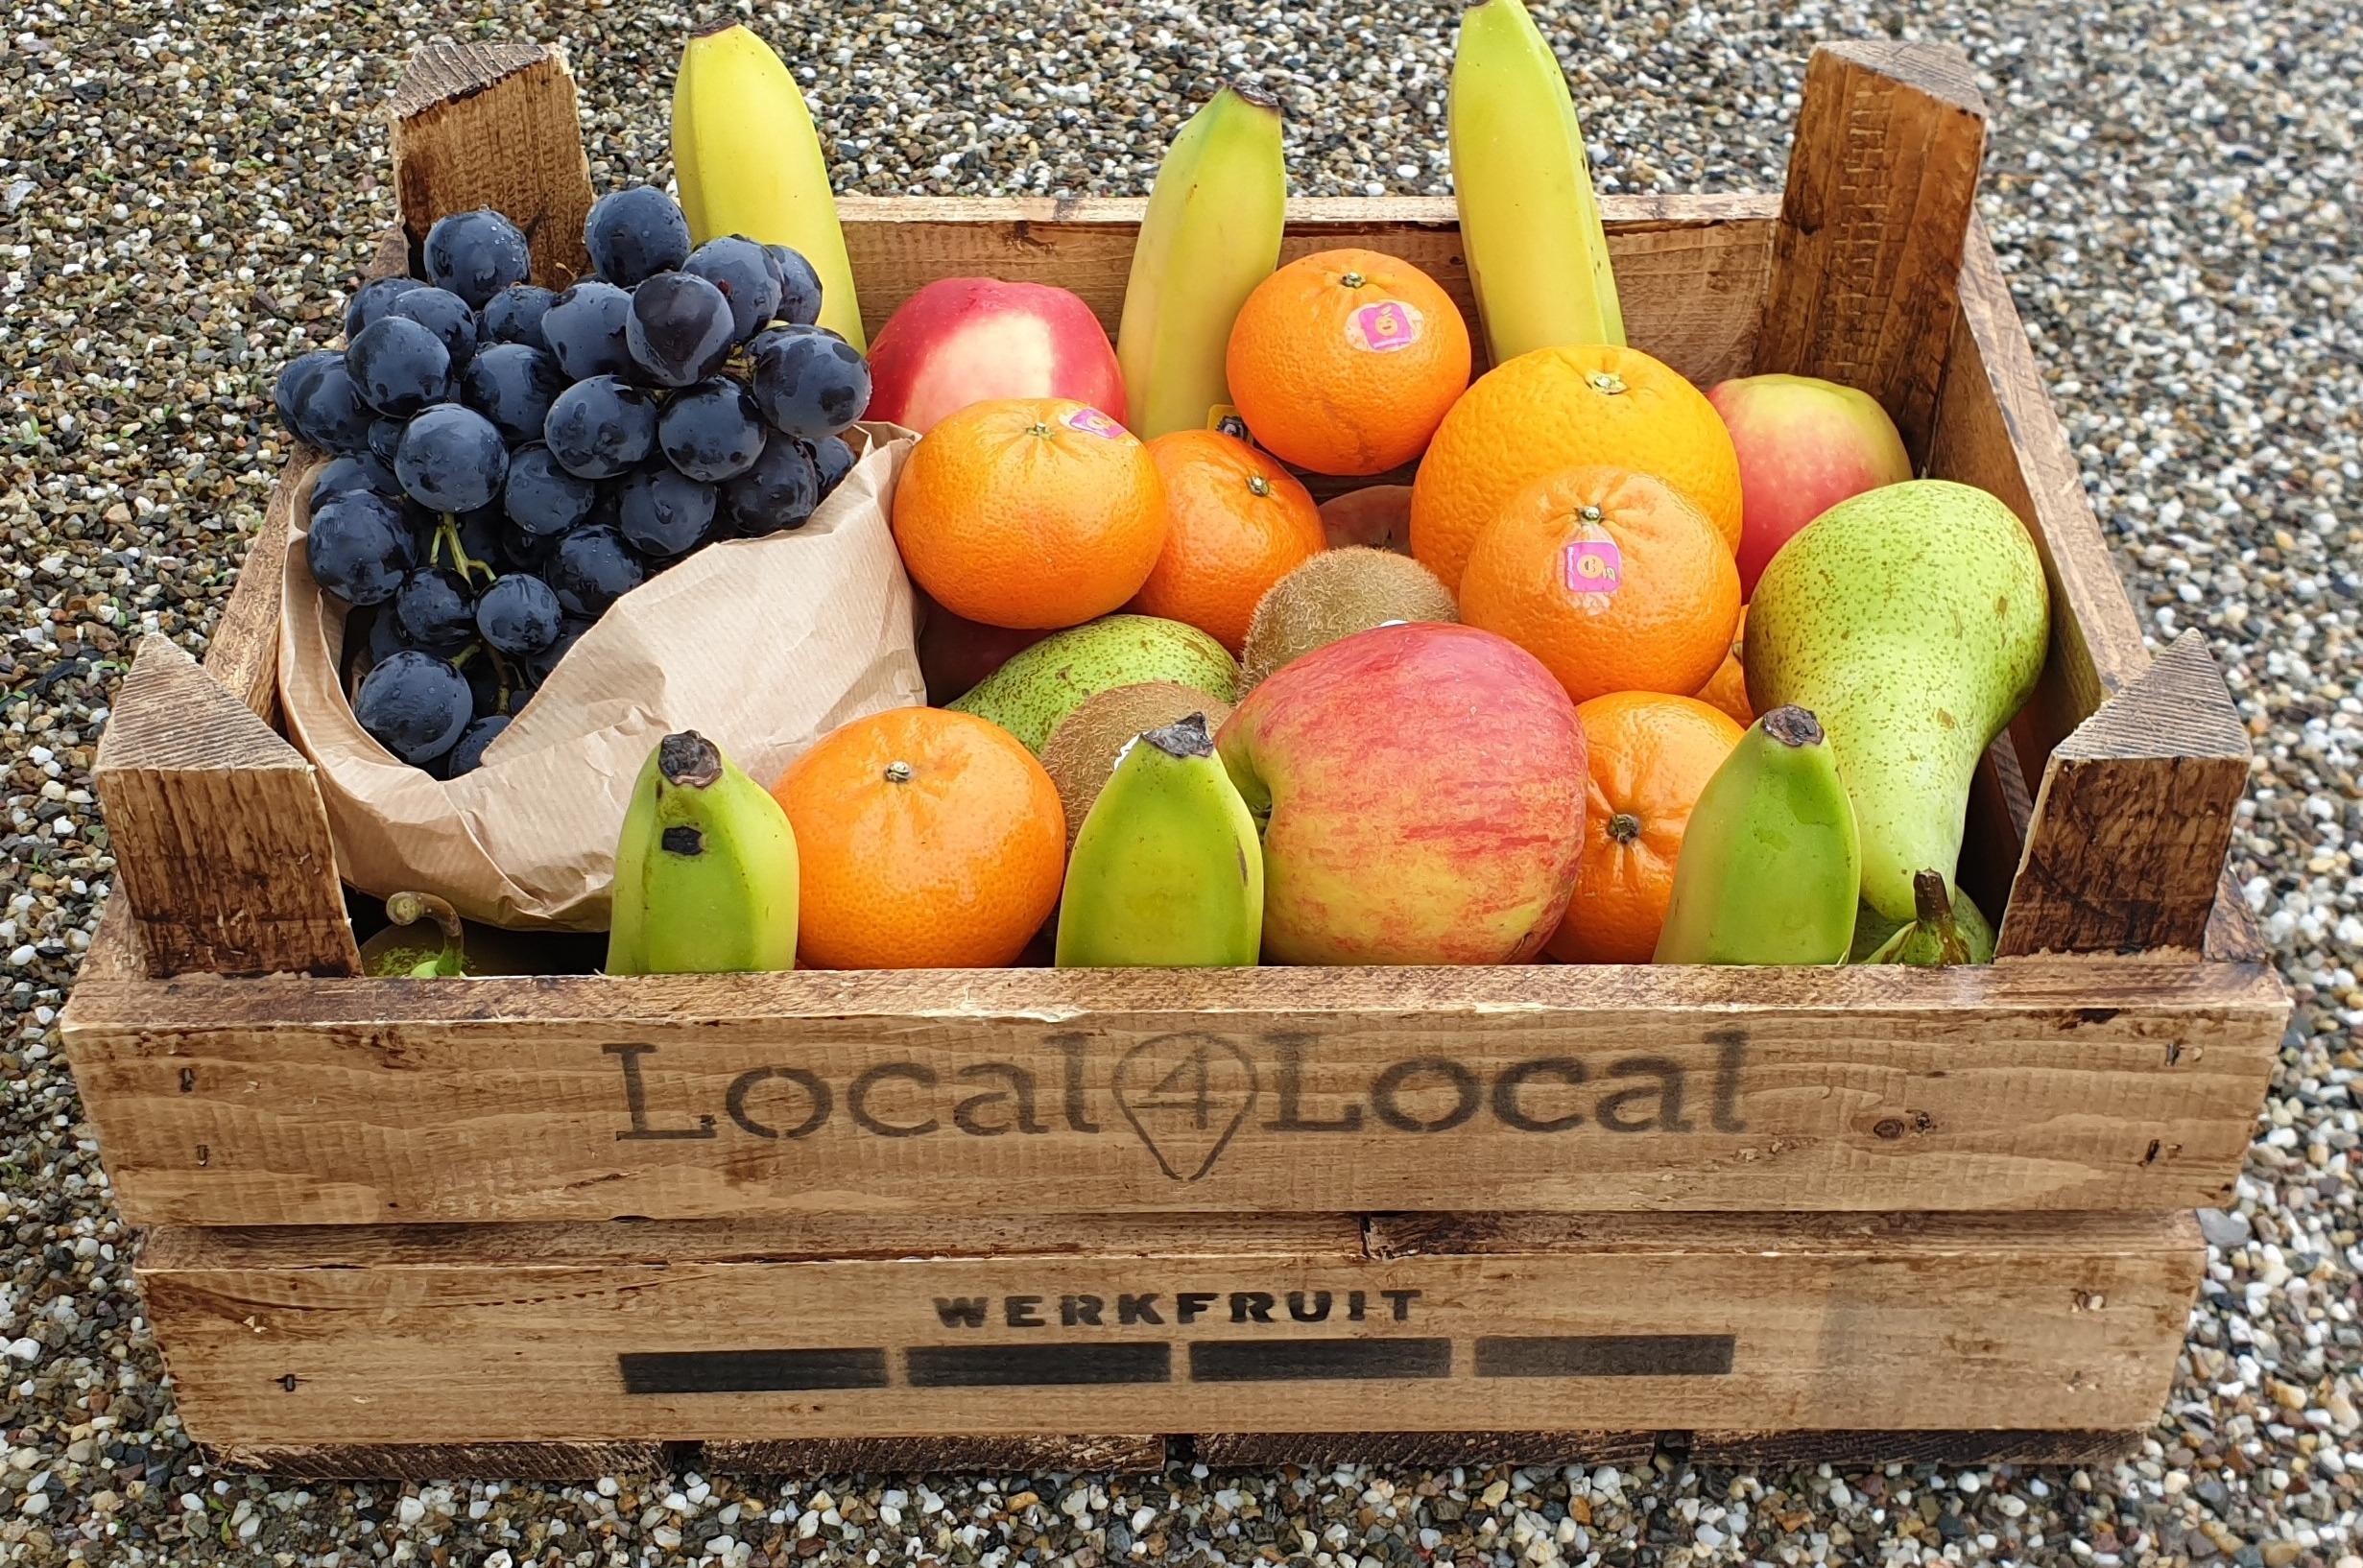 Werkfruit local 4 local  30 plus 1 x seizoen fruit